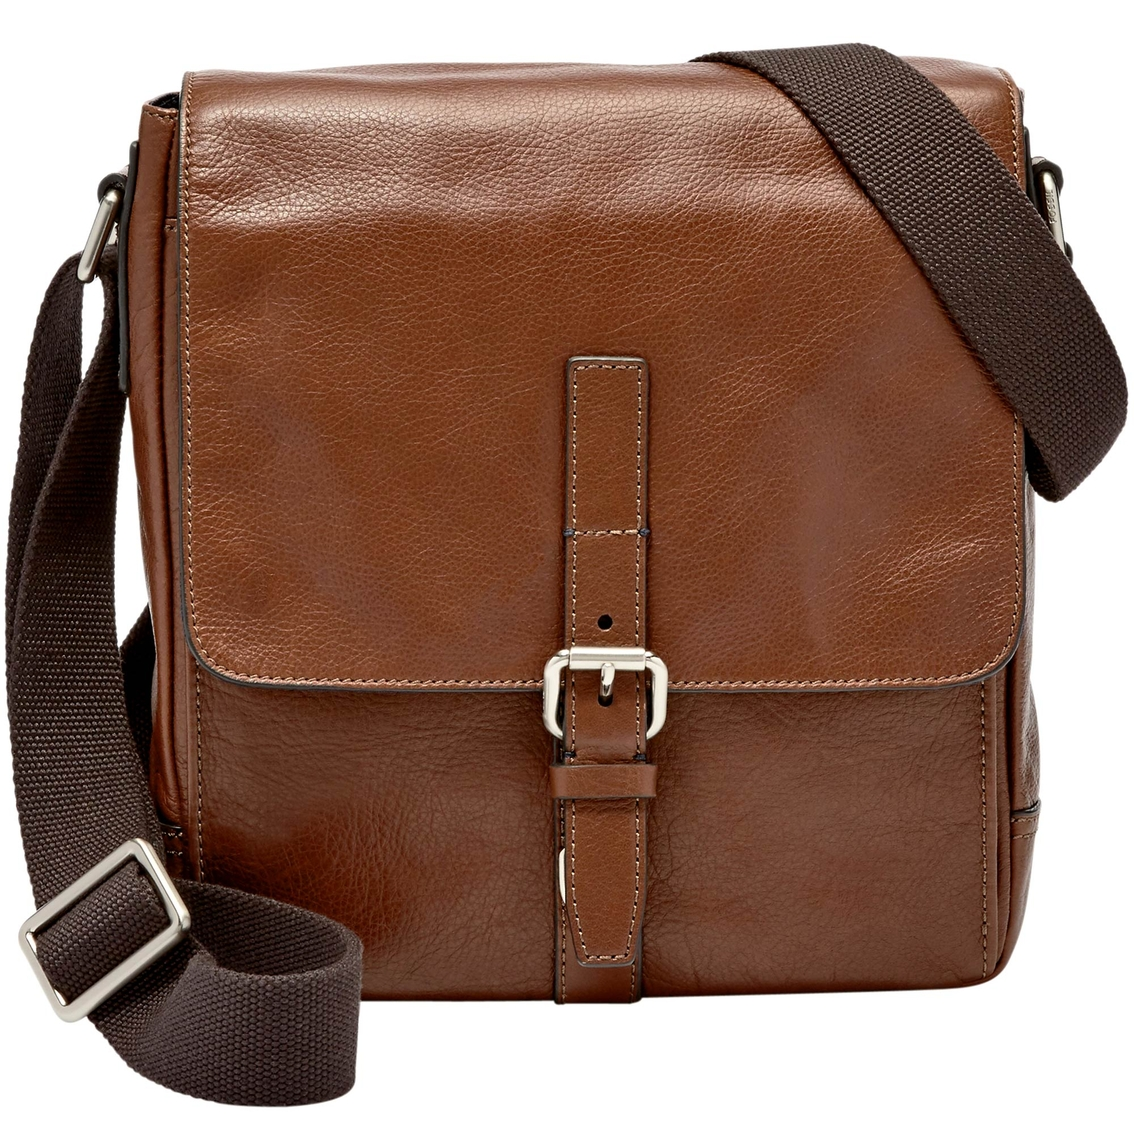 Fossil Davis City North South Messenger Bag | Business Cases | More | Shop The Exchange